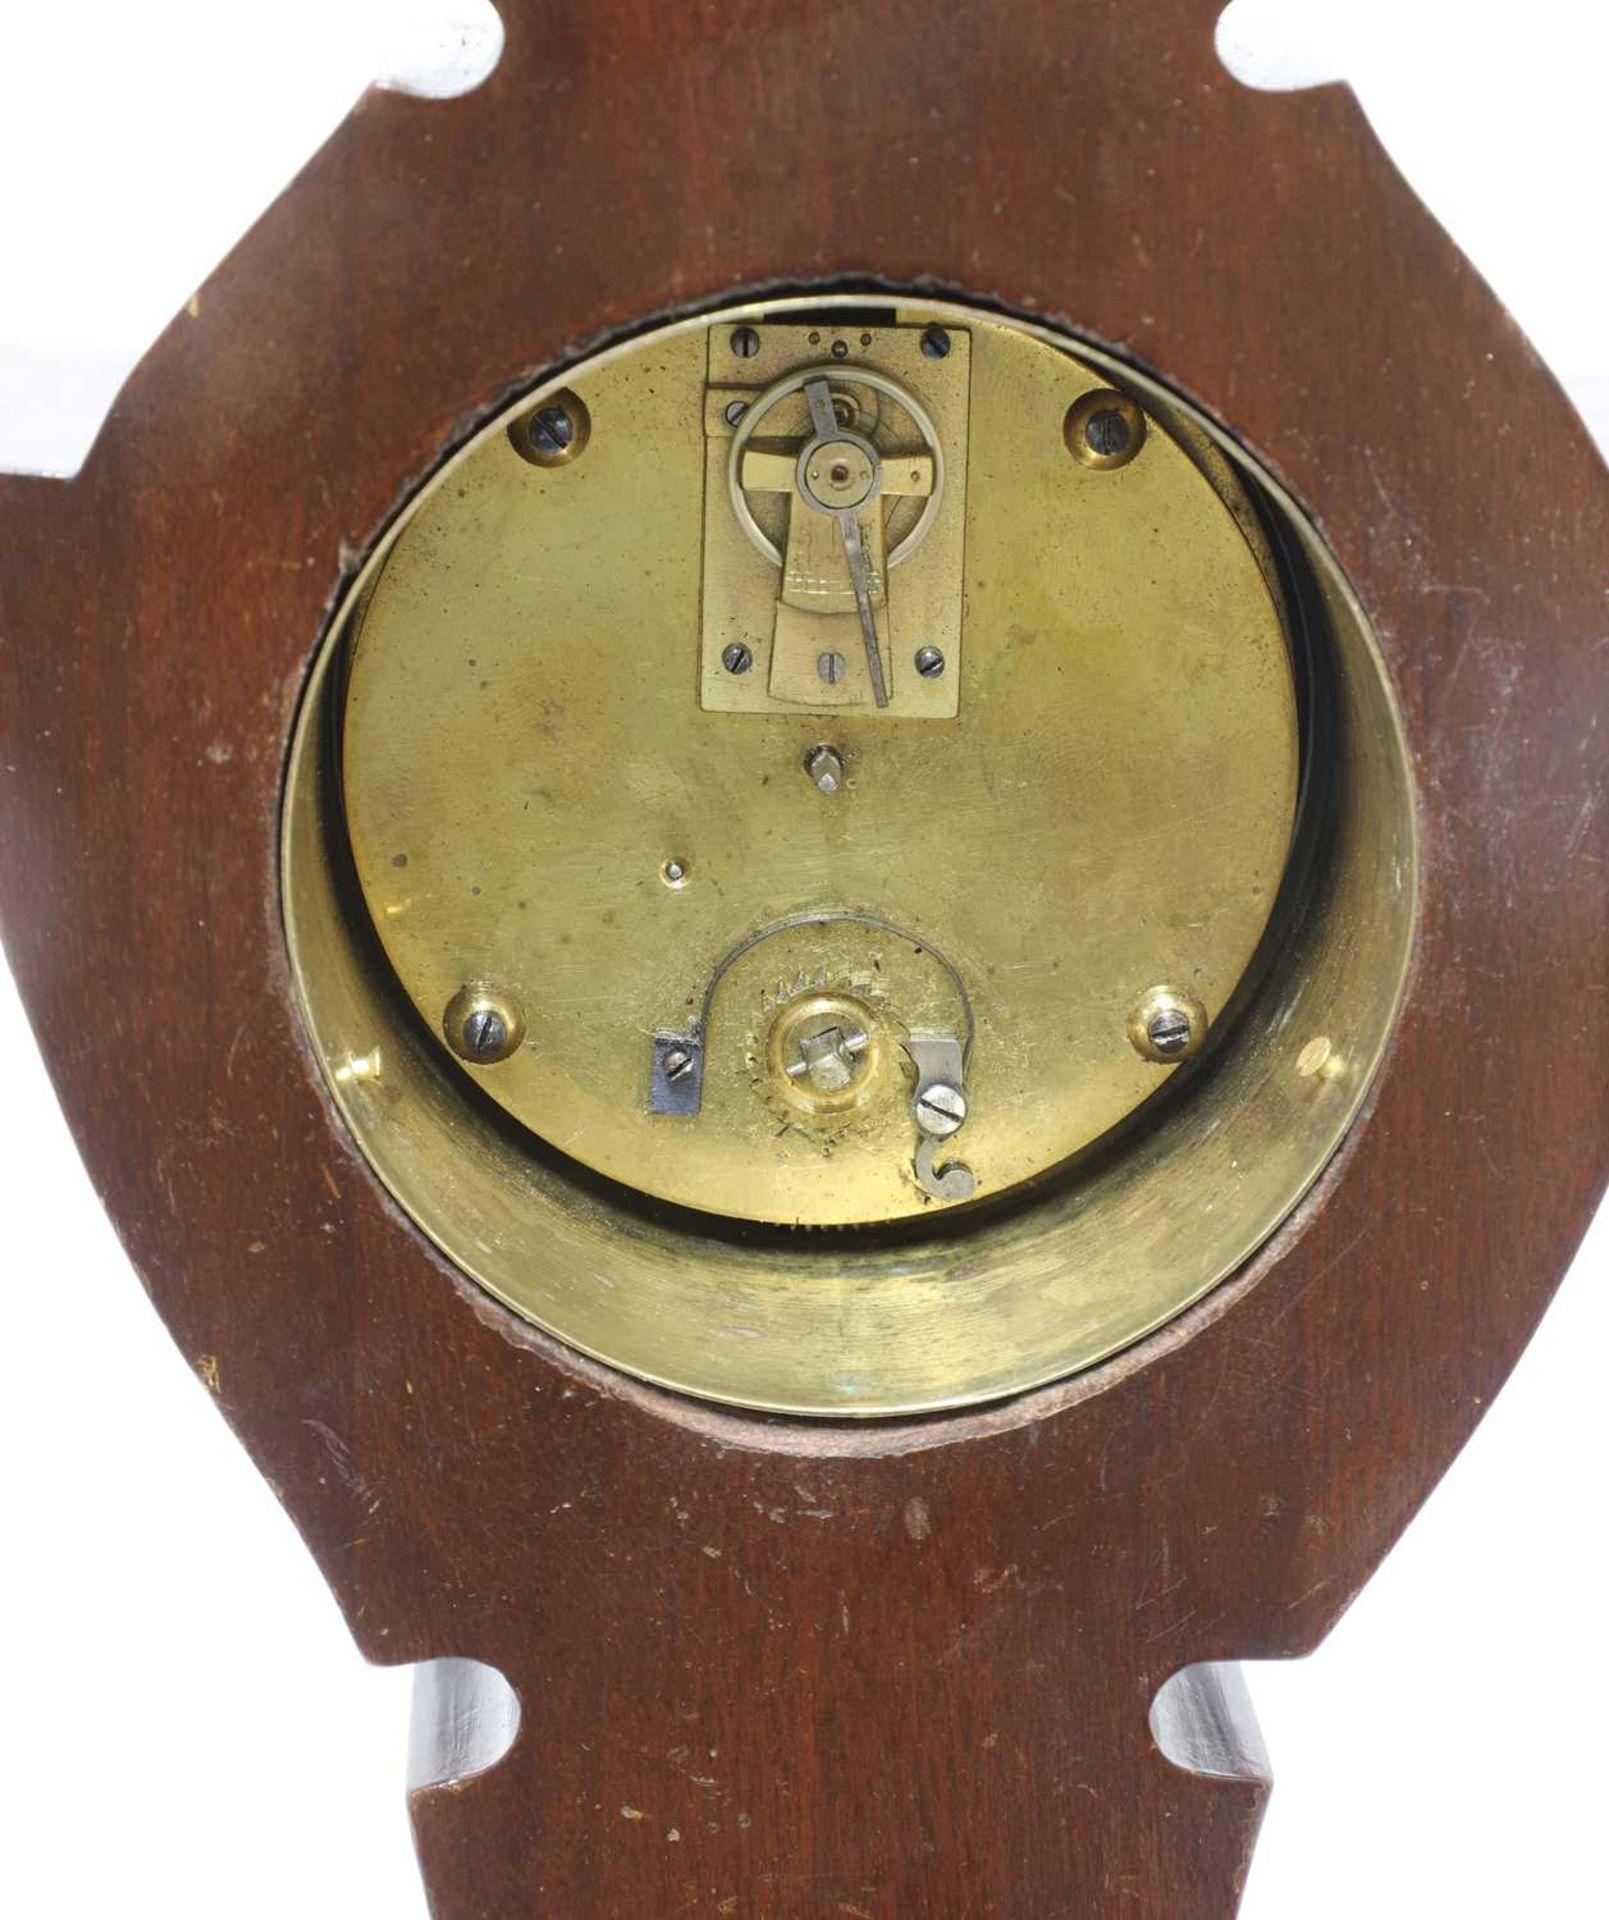 An Art Nouveau silver-mounted mantel clock, - Image 2 of 4